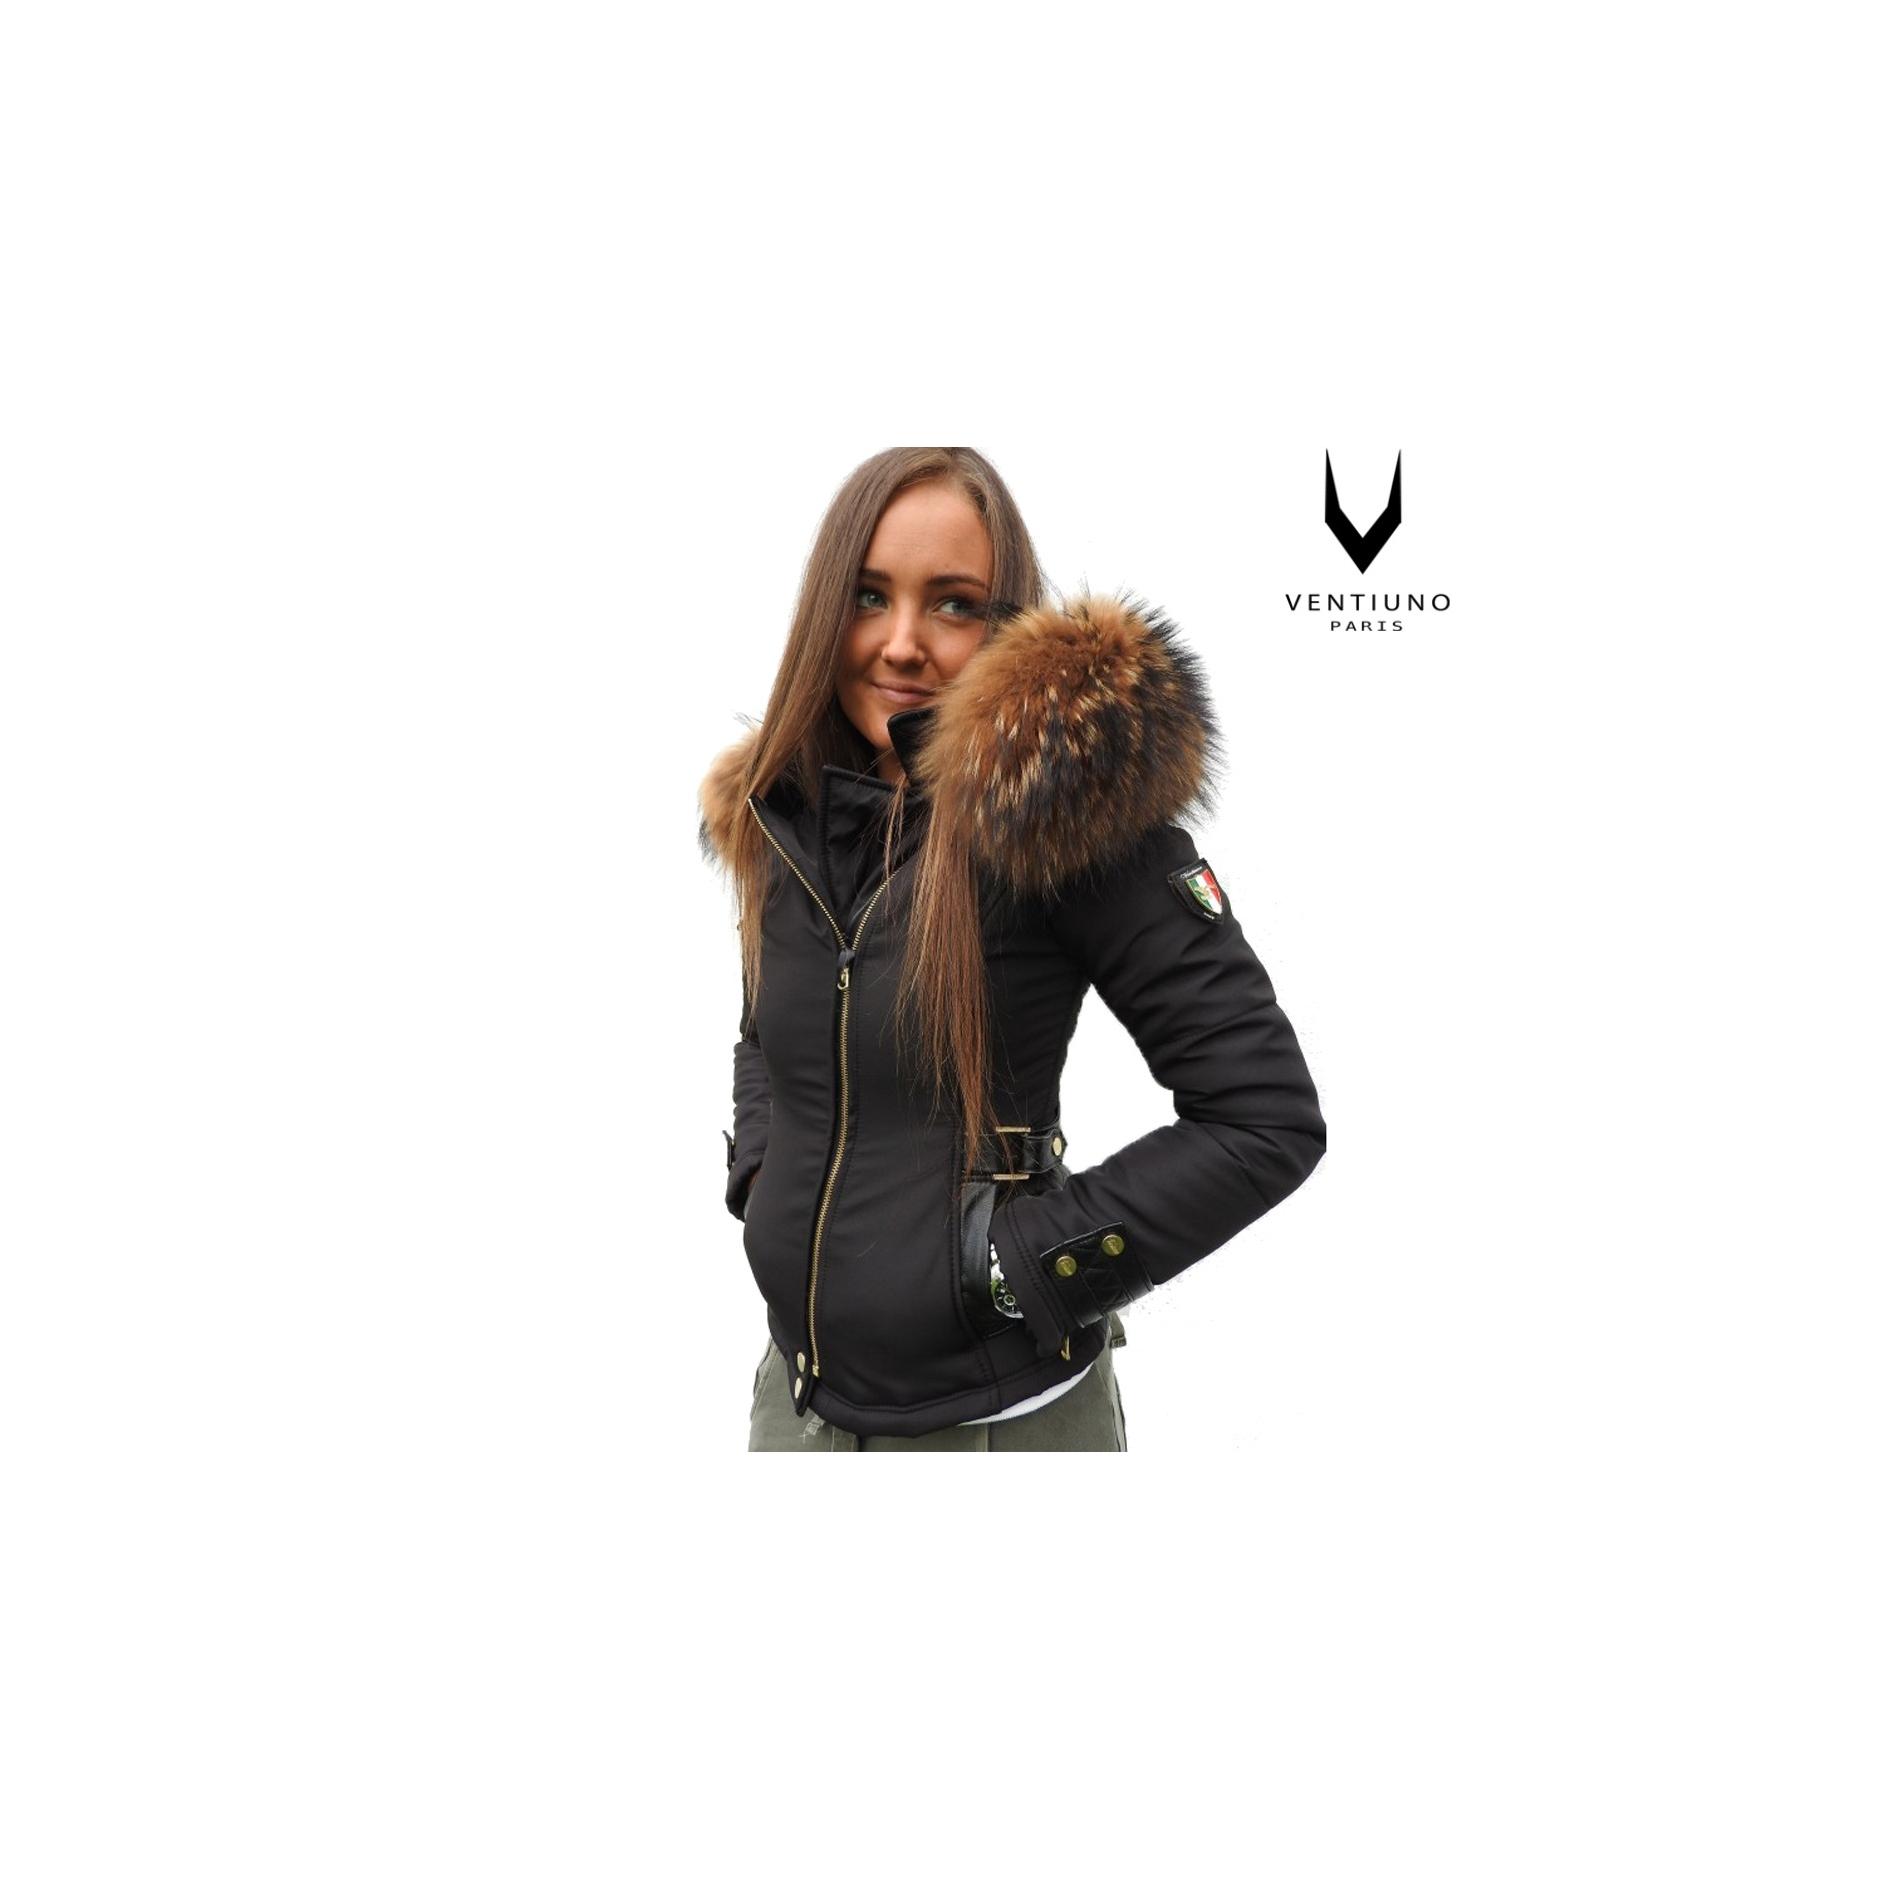 083f7144ee00 EMILY - SOFIA Ventiuno Veste Perfecto noir Bi-matière fourrure véritable et  cuir - doudoune ventiuno